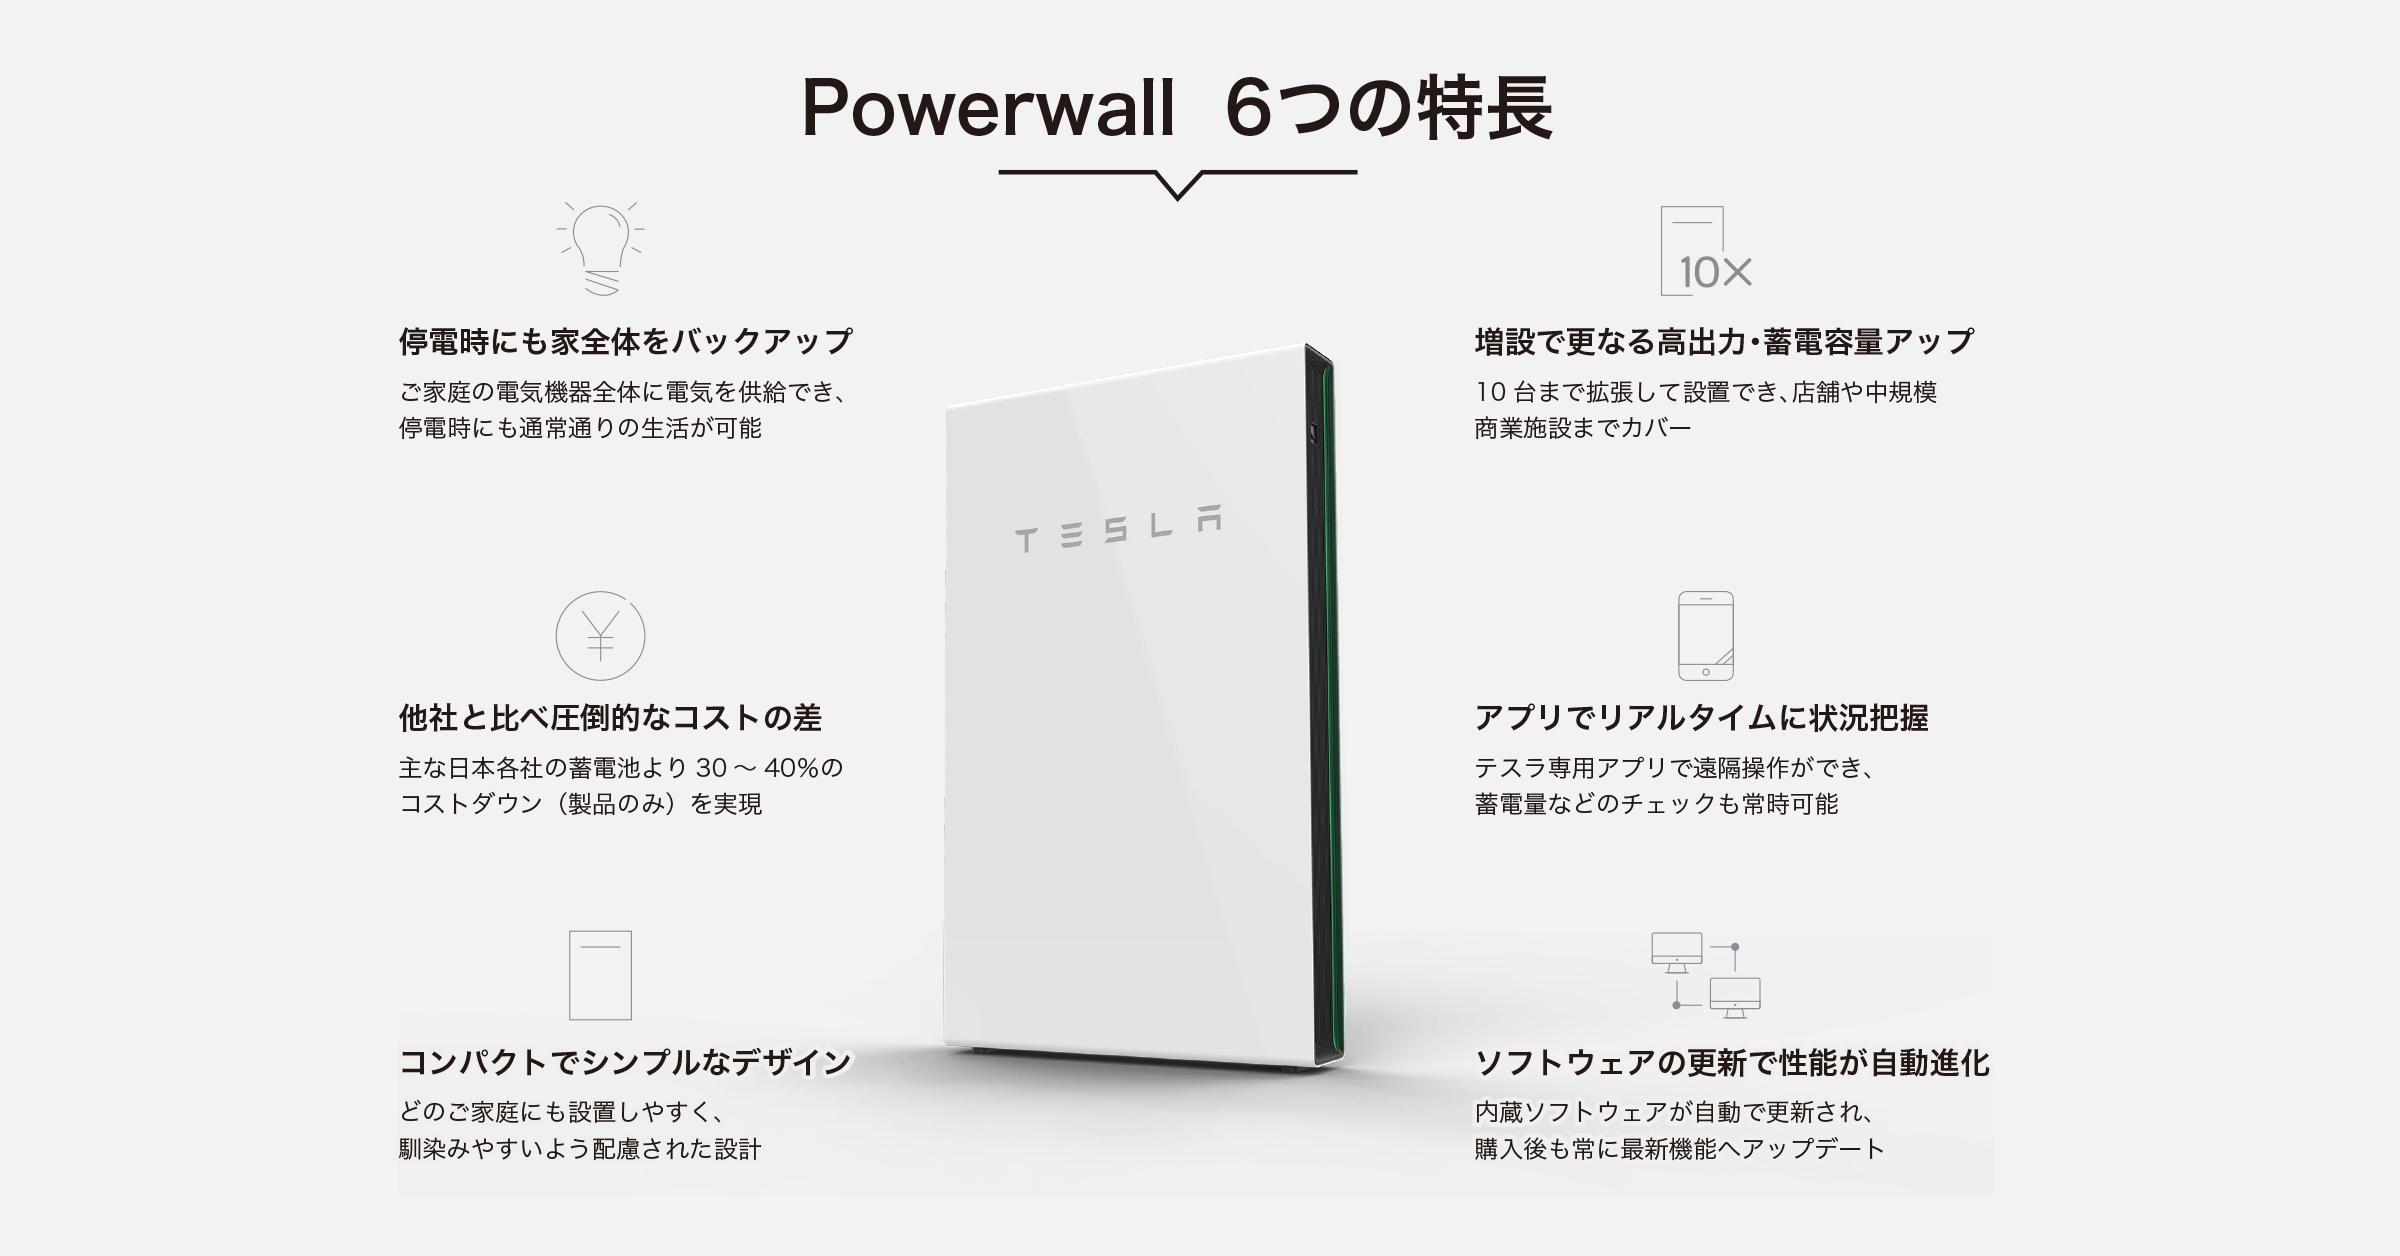 Tesla蓄電池Powerwall6つの特長